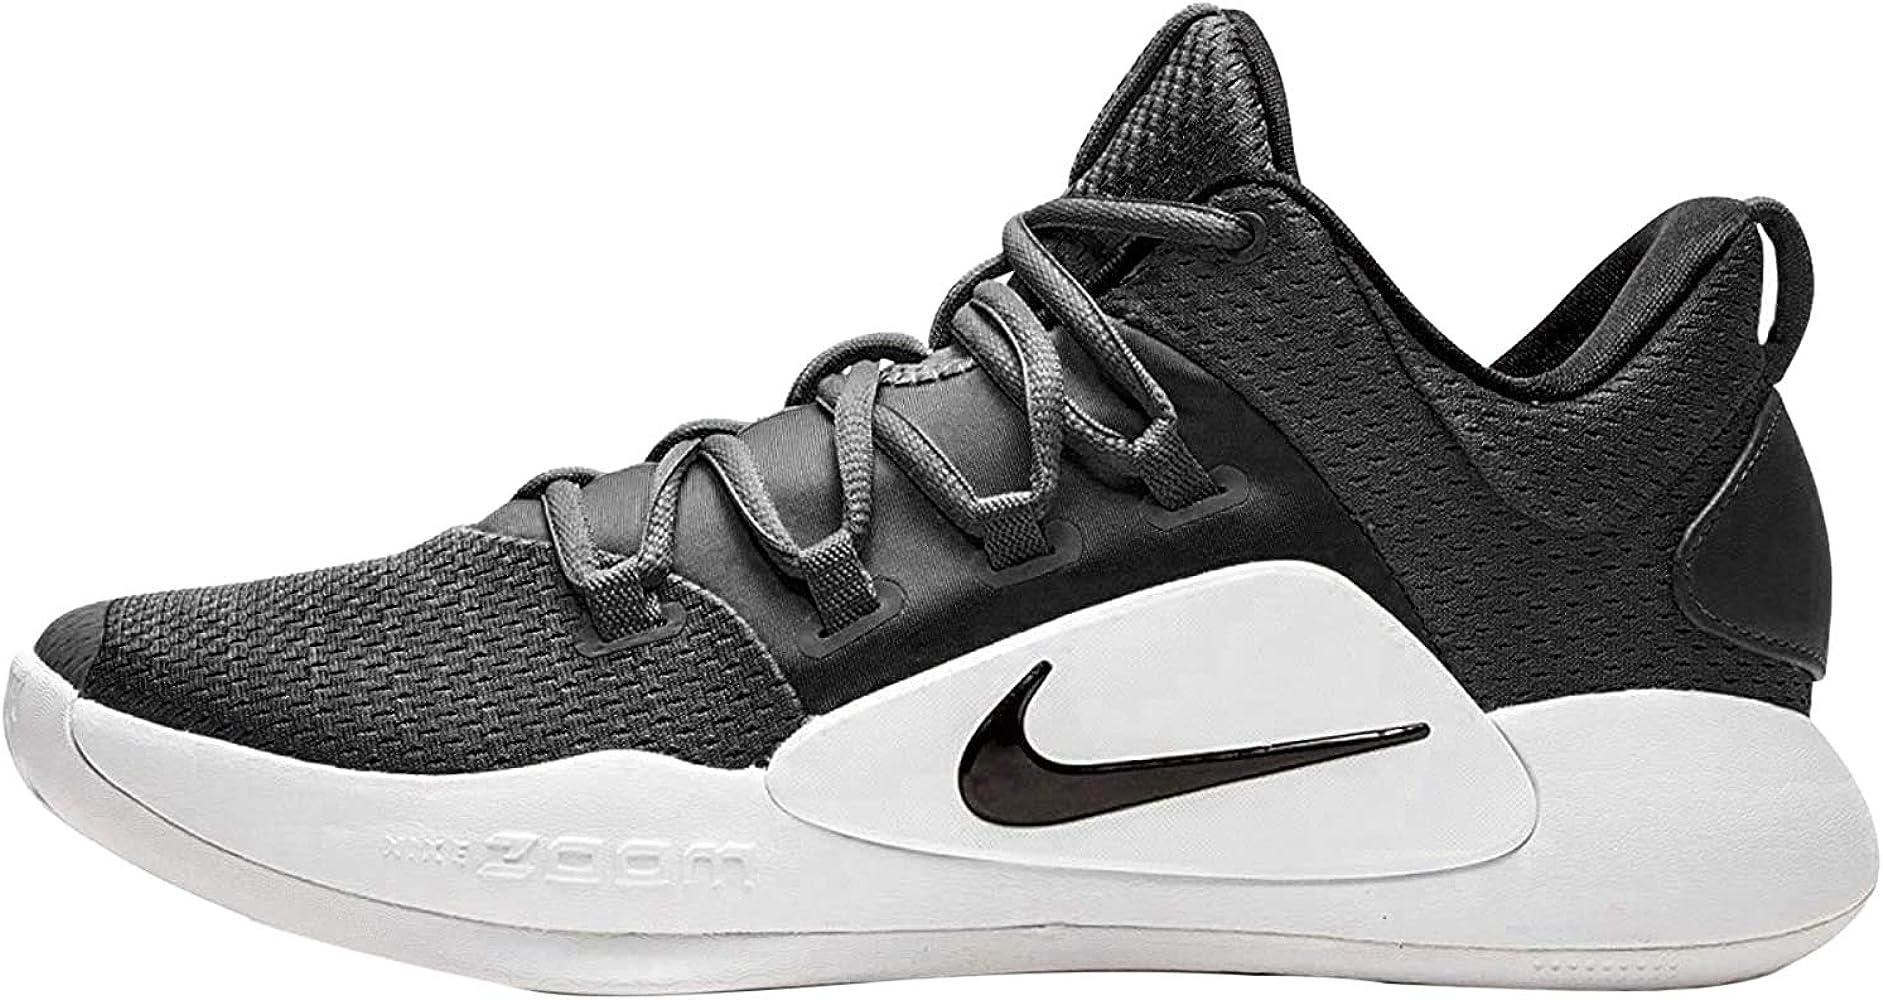 Nike Men's Hyperdunk X Low Team